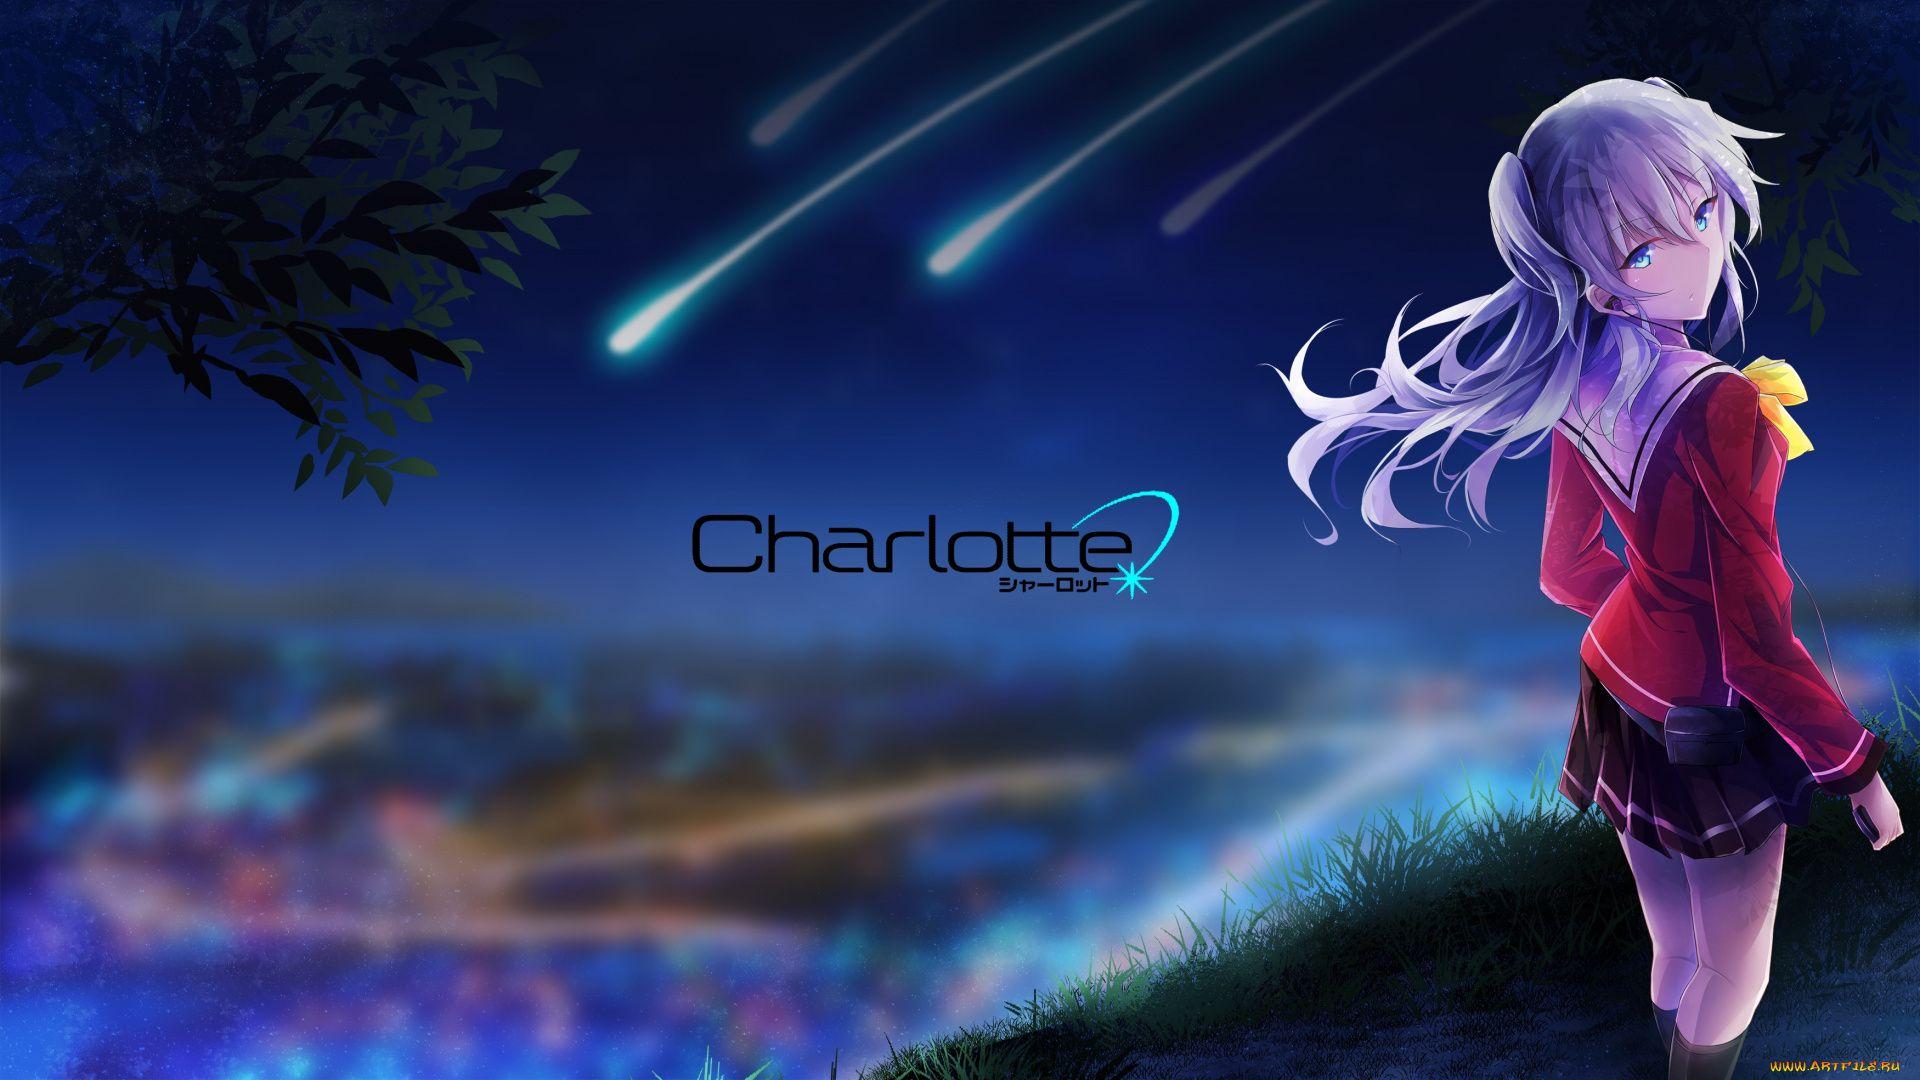 Charlotte picture hd